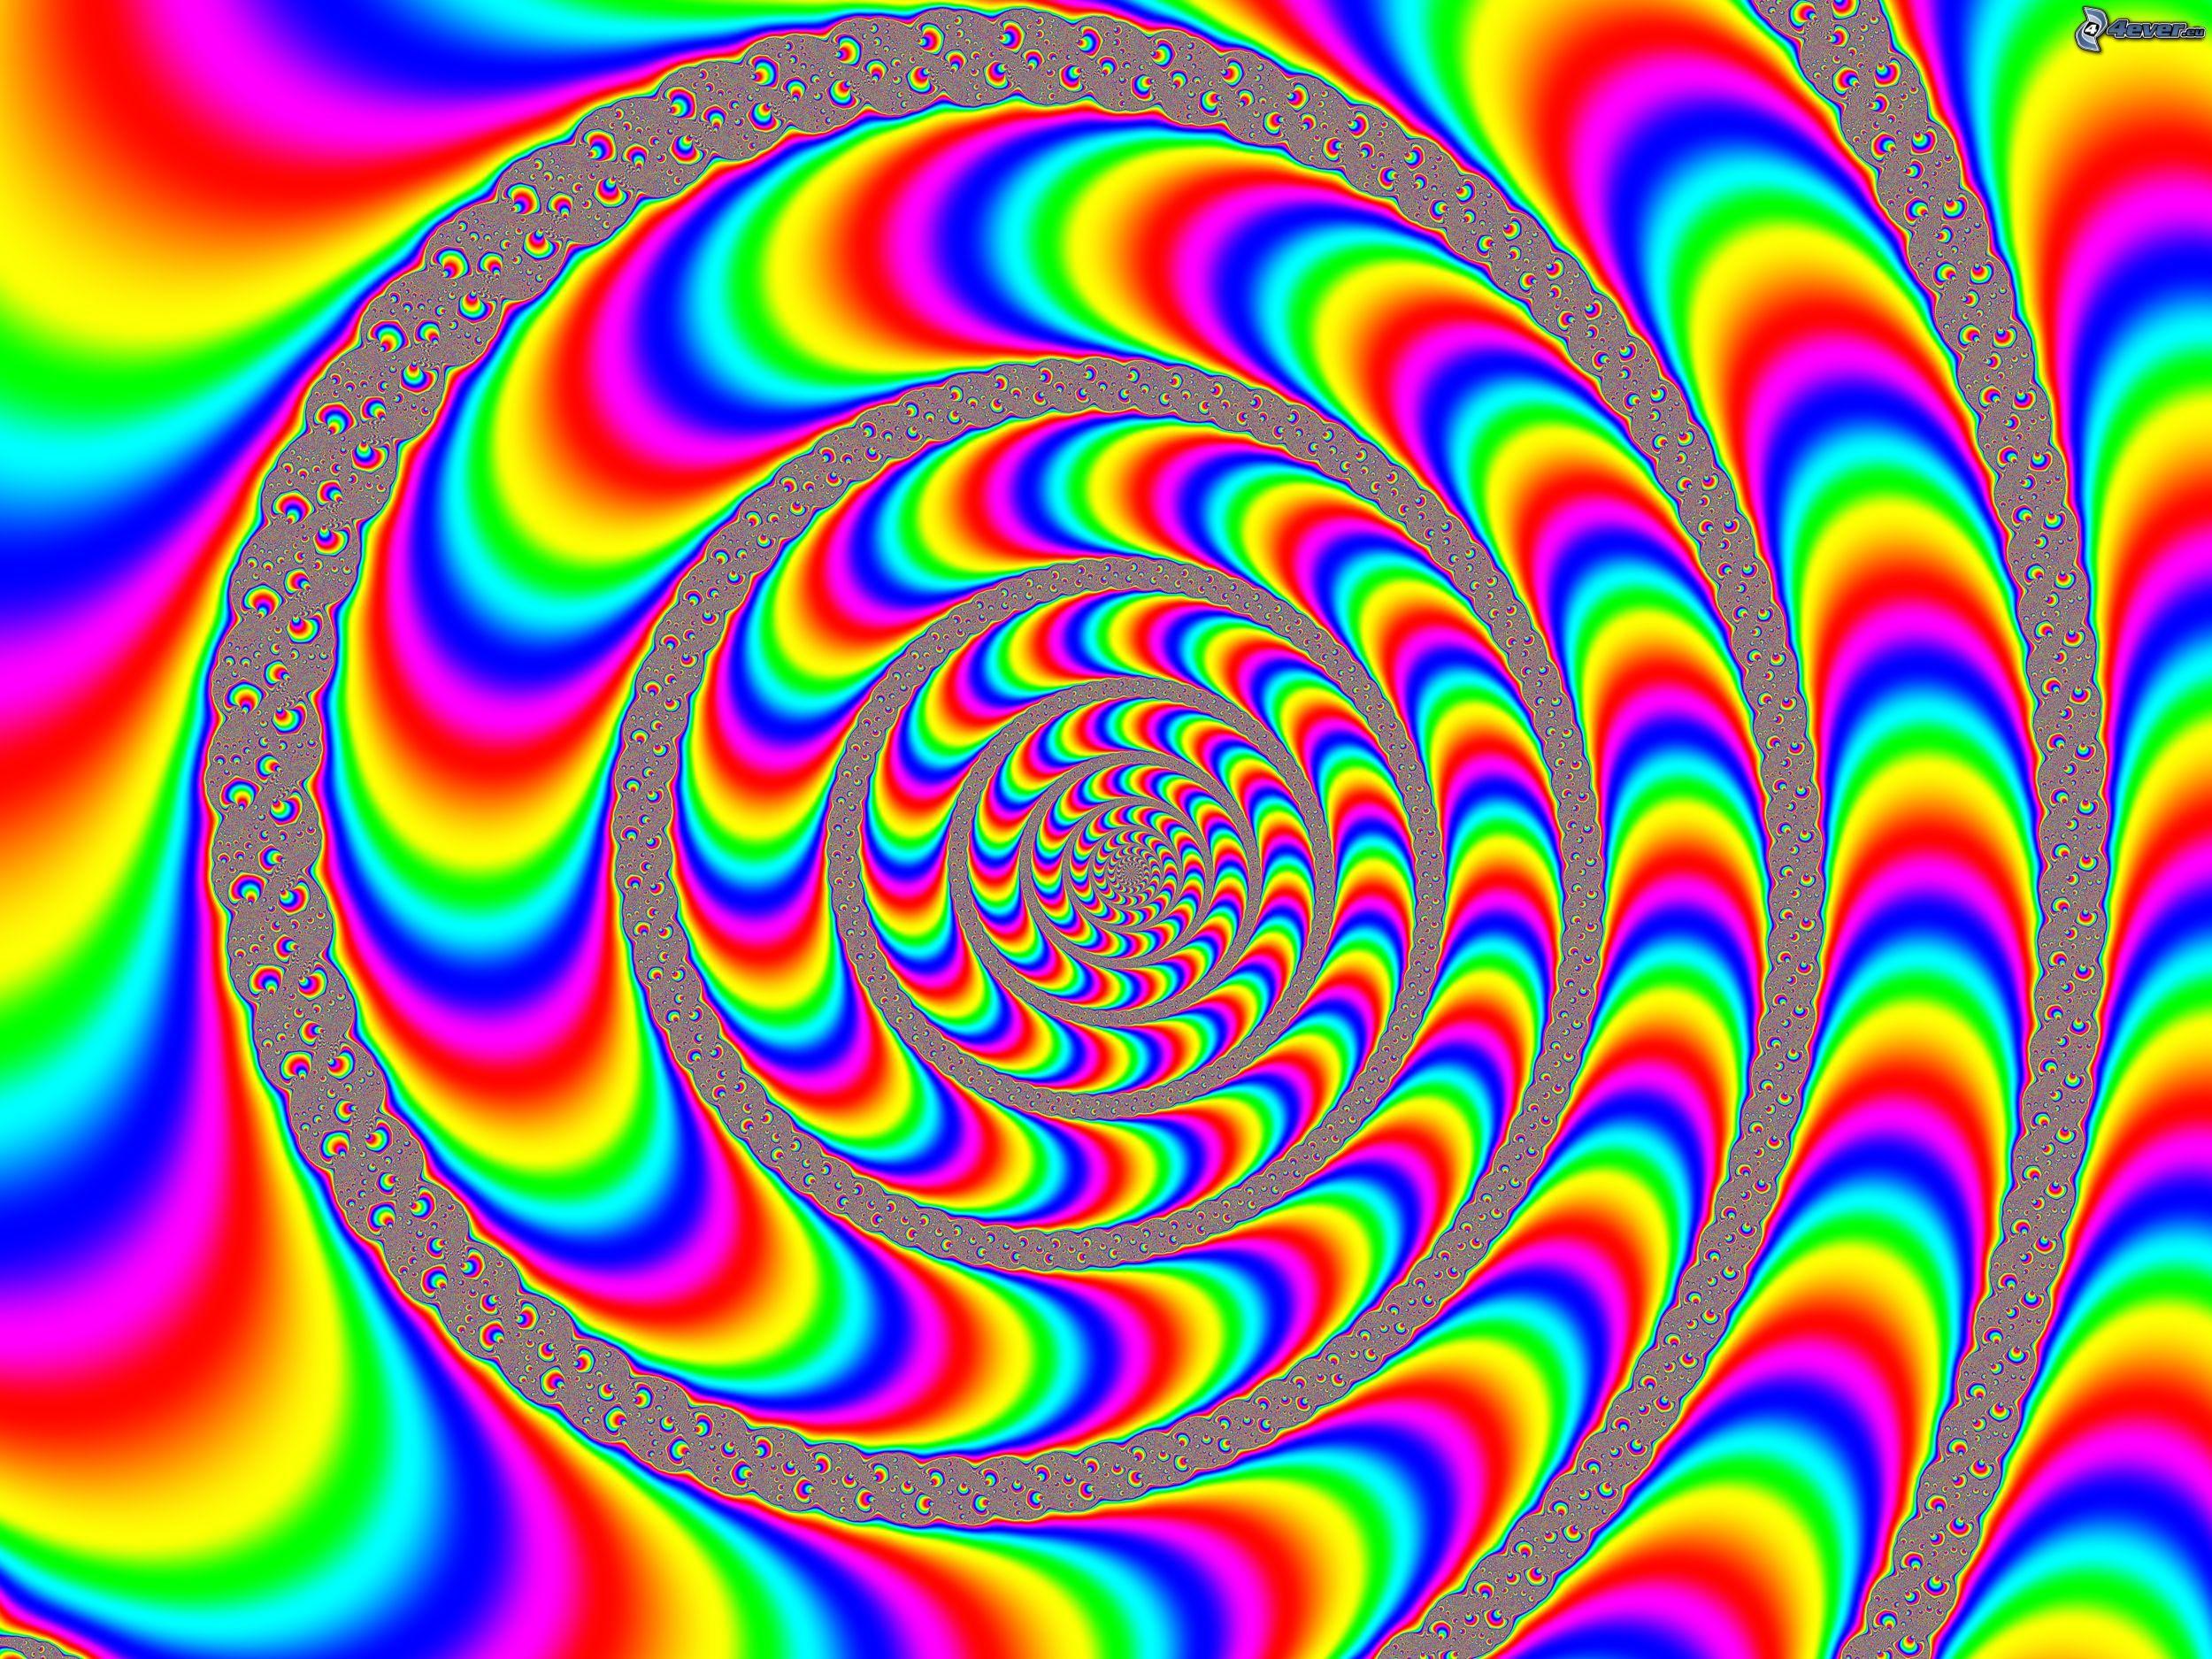 Optical Illusion Optical Illusion Wallpaper Cool Optical Illusions Moving Optical Illusions